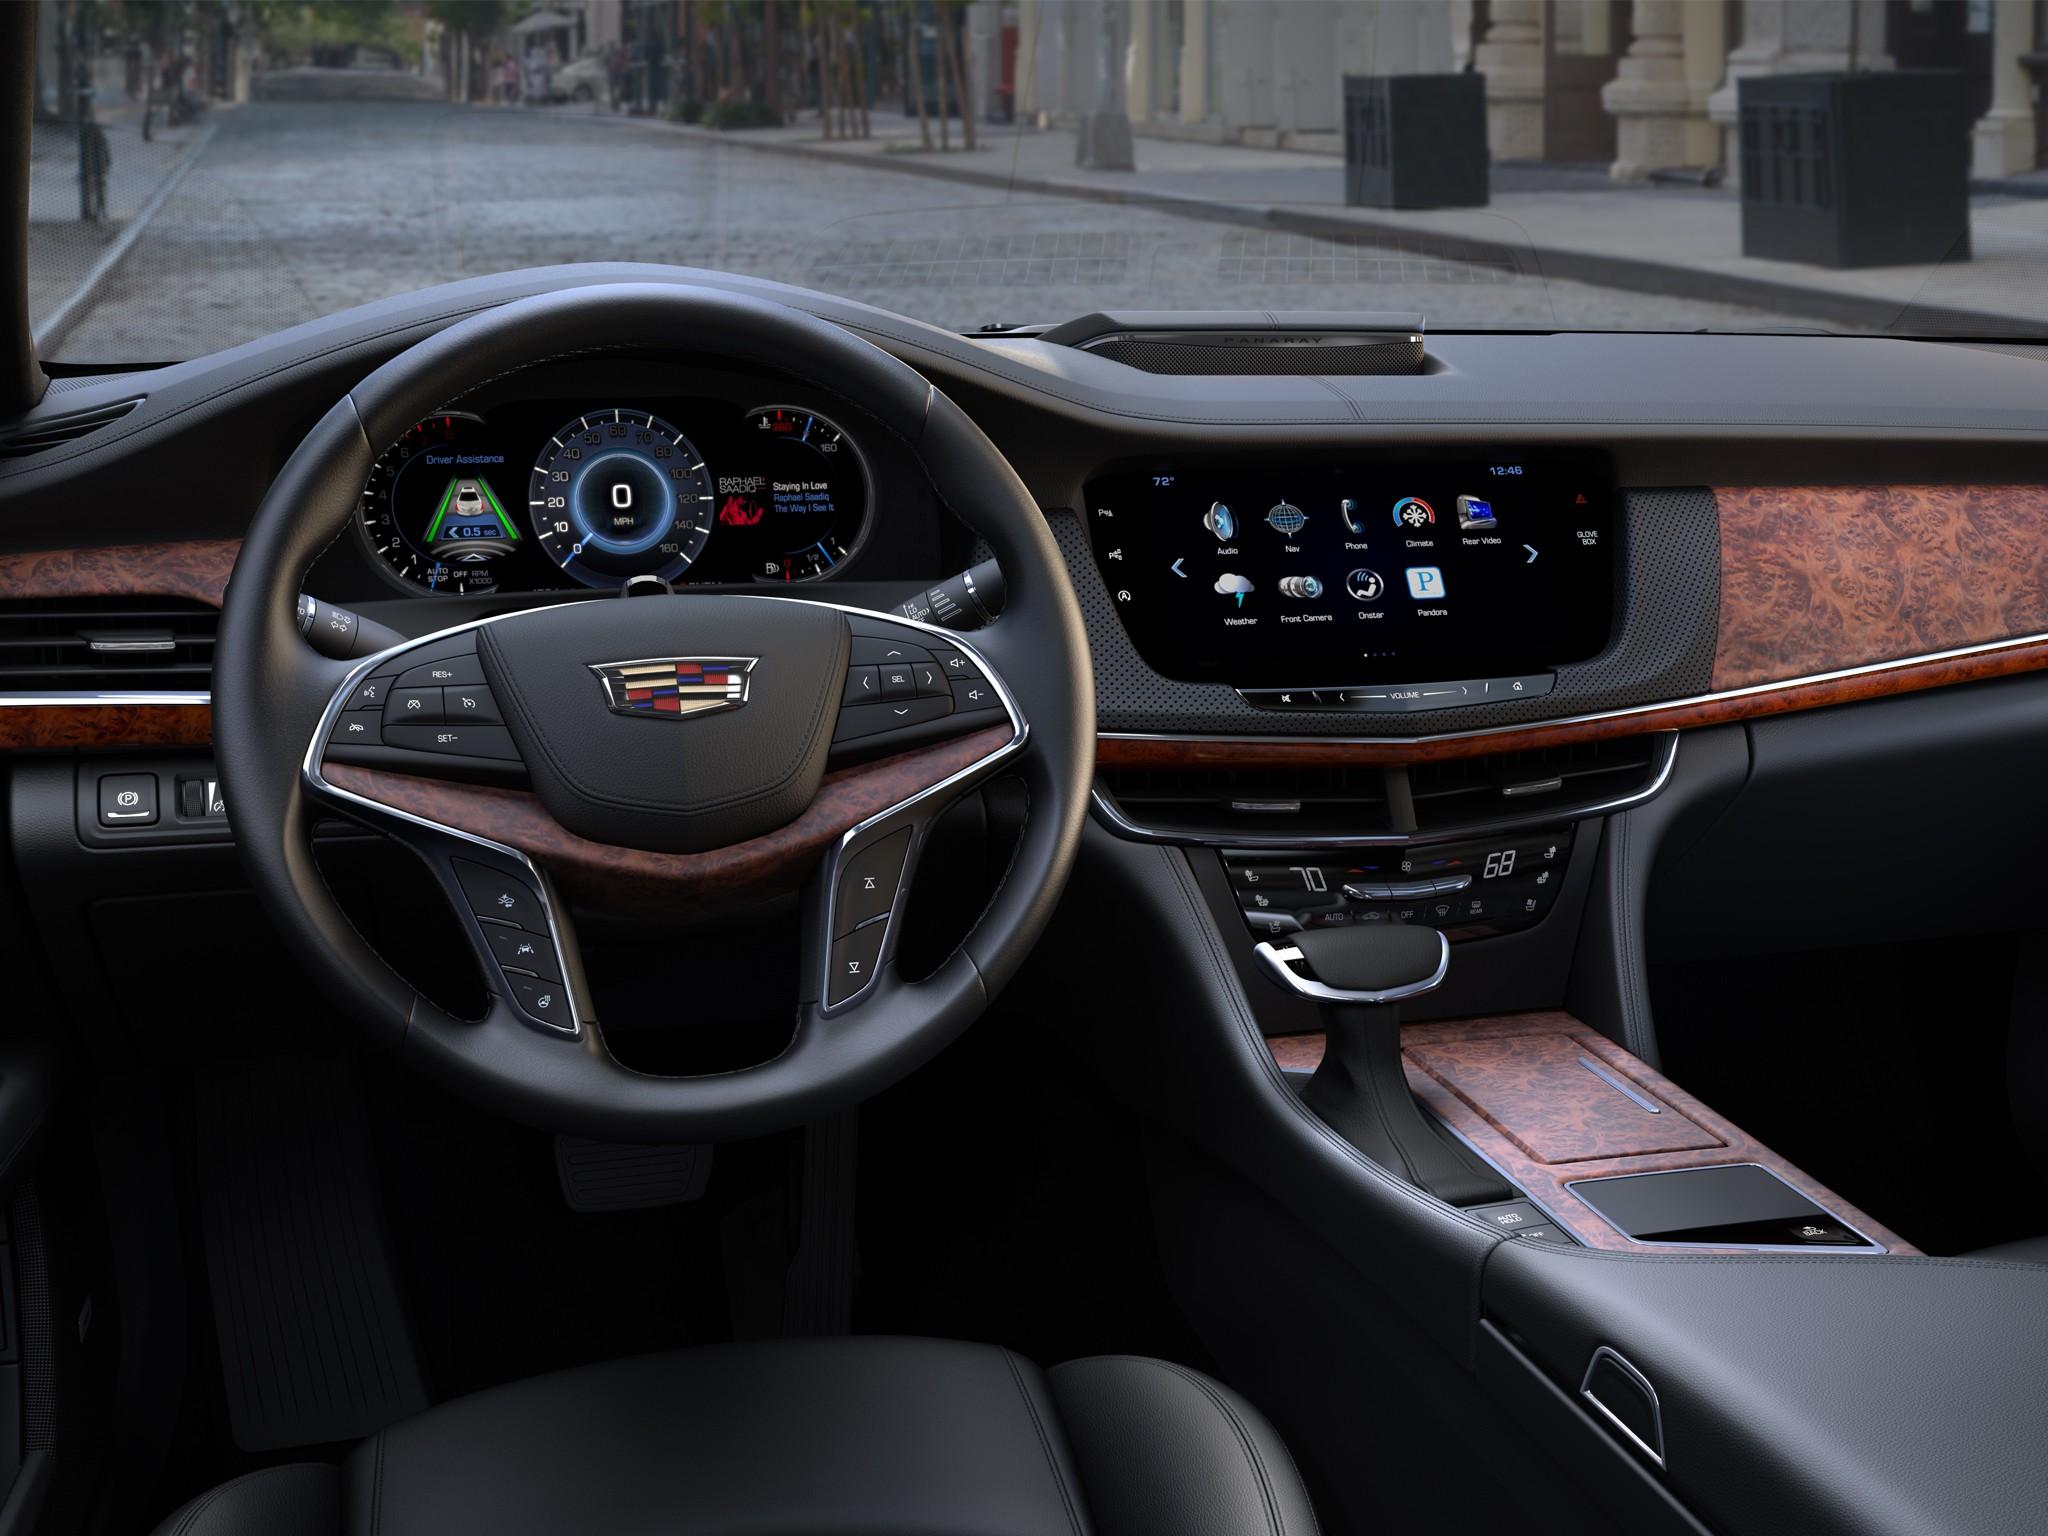 2017 Cadillac Elmiraj Price >> 2016 Cadillac CT6 Leaked Ahead of NYIAS Debut - autoevolution